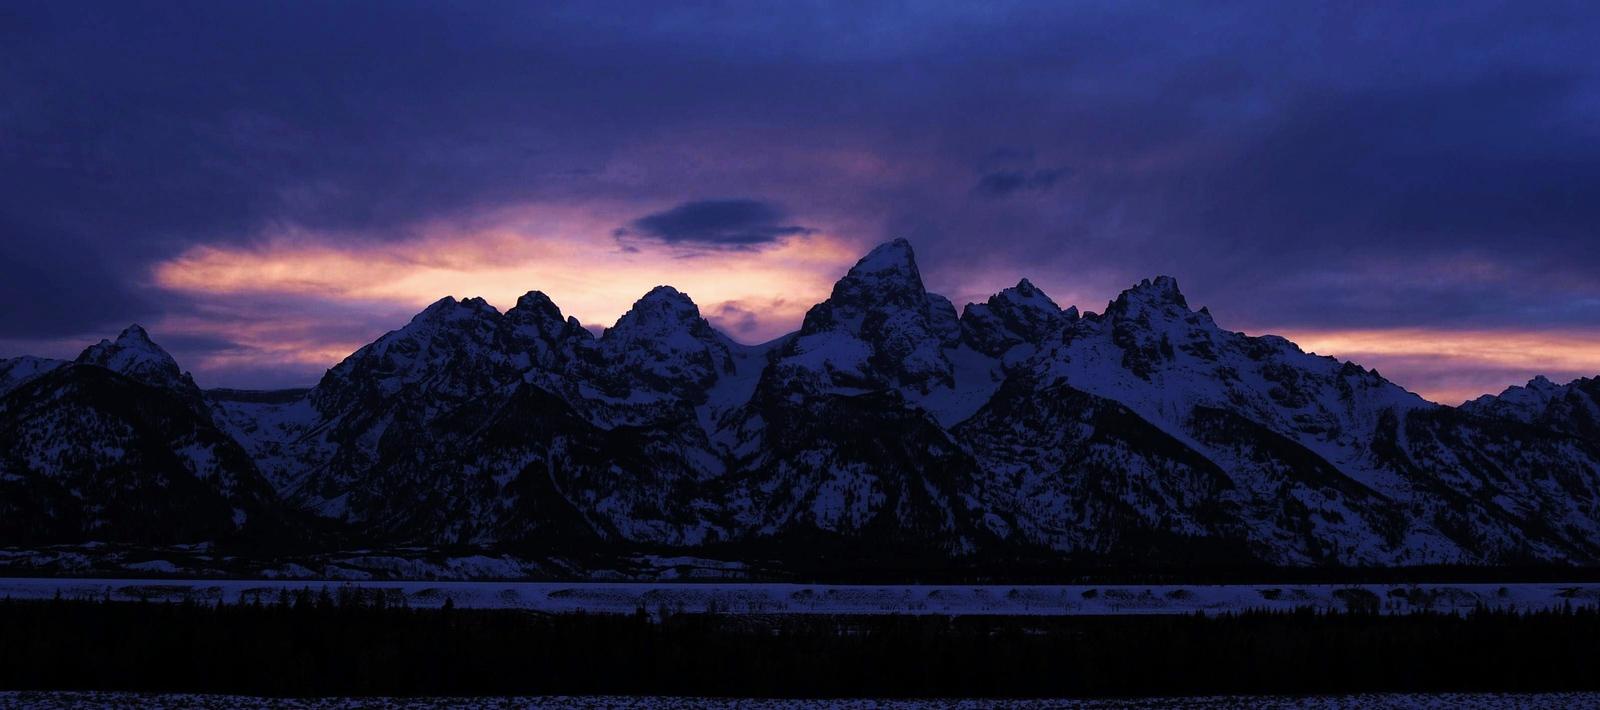 The Tetons at sunset.